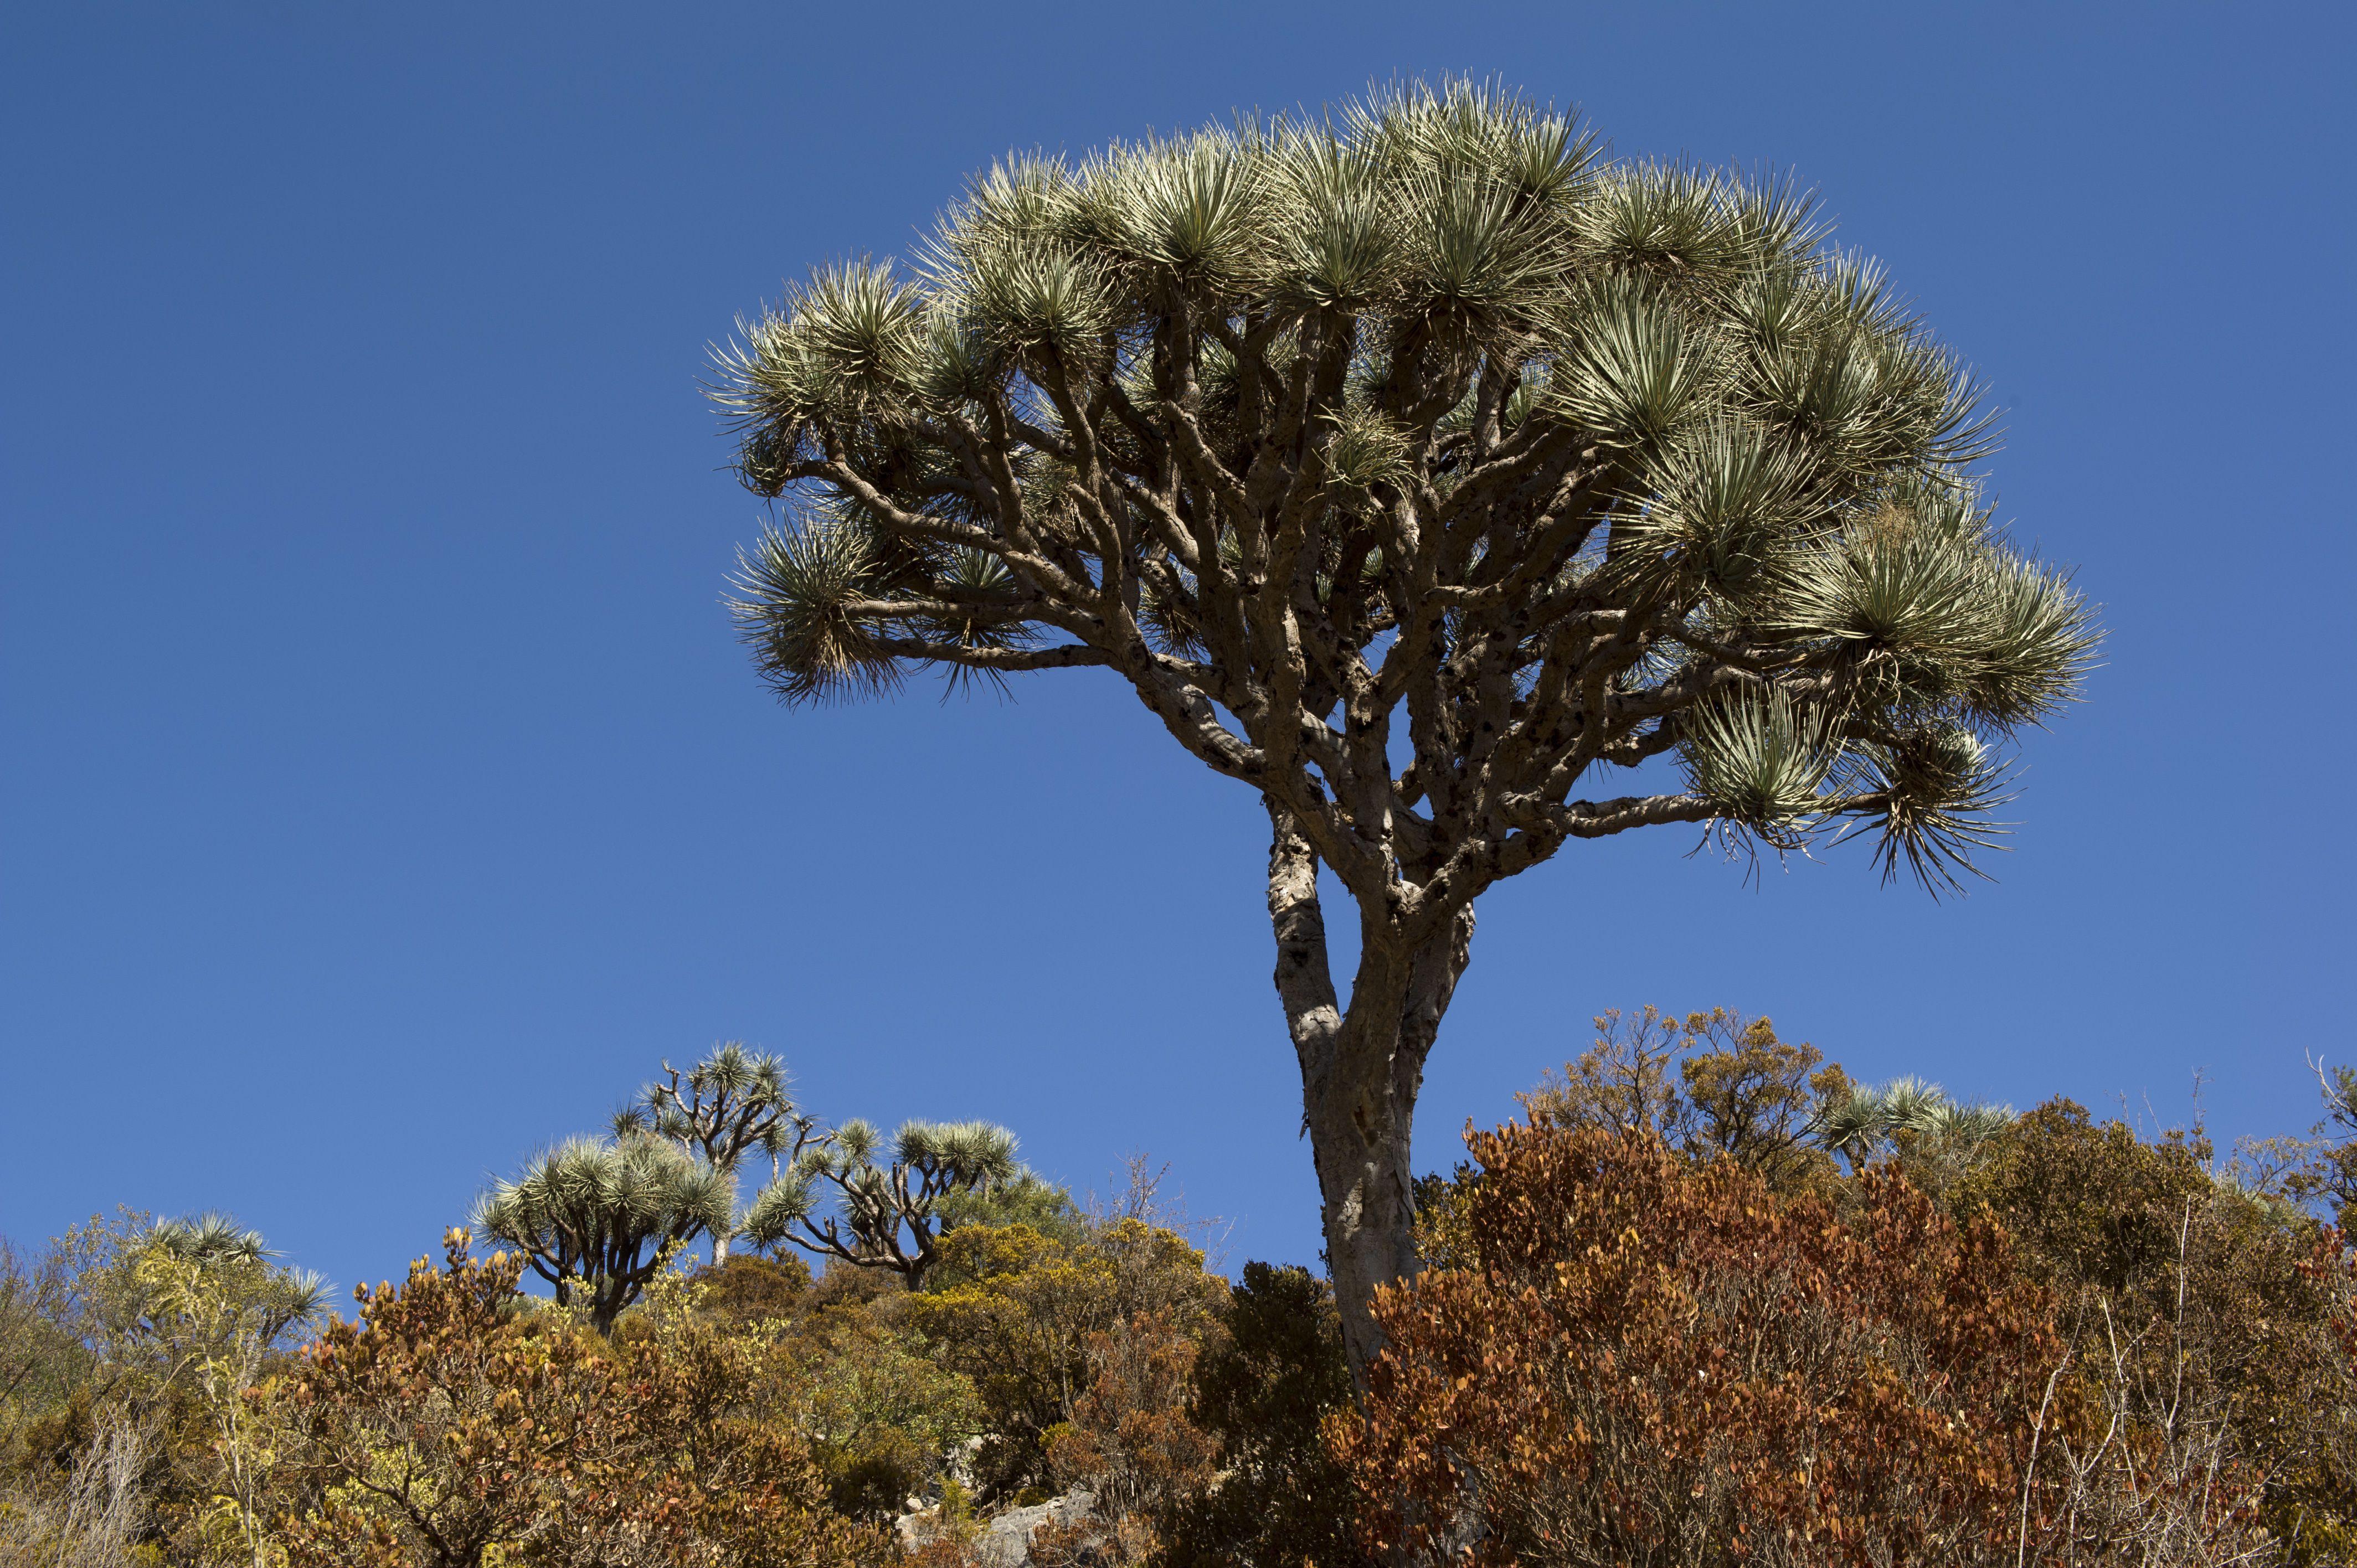 Dragon blood tree (Draceana ombet) on Daallo escarpment.